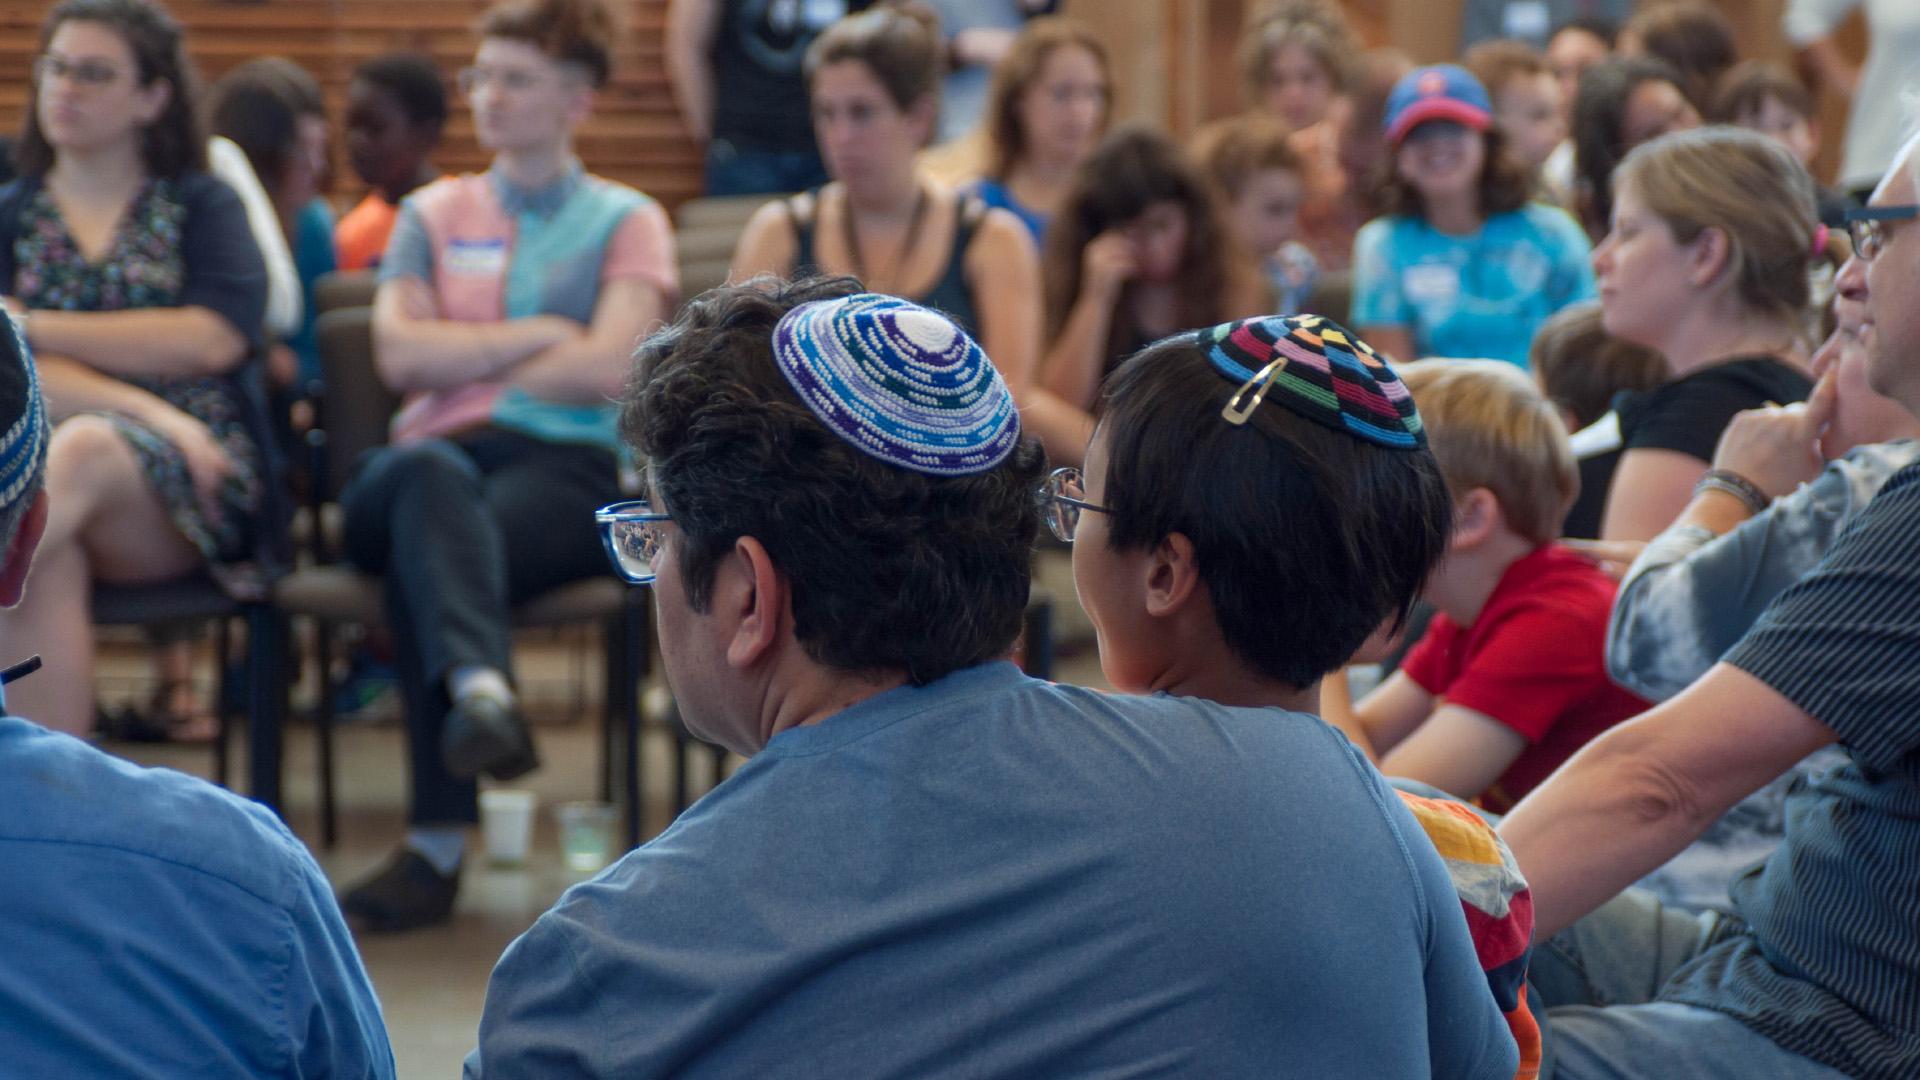 jewish-reconstructionist-congregation-tuesday-minyan